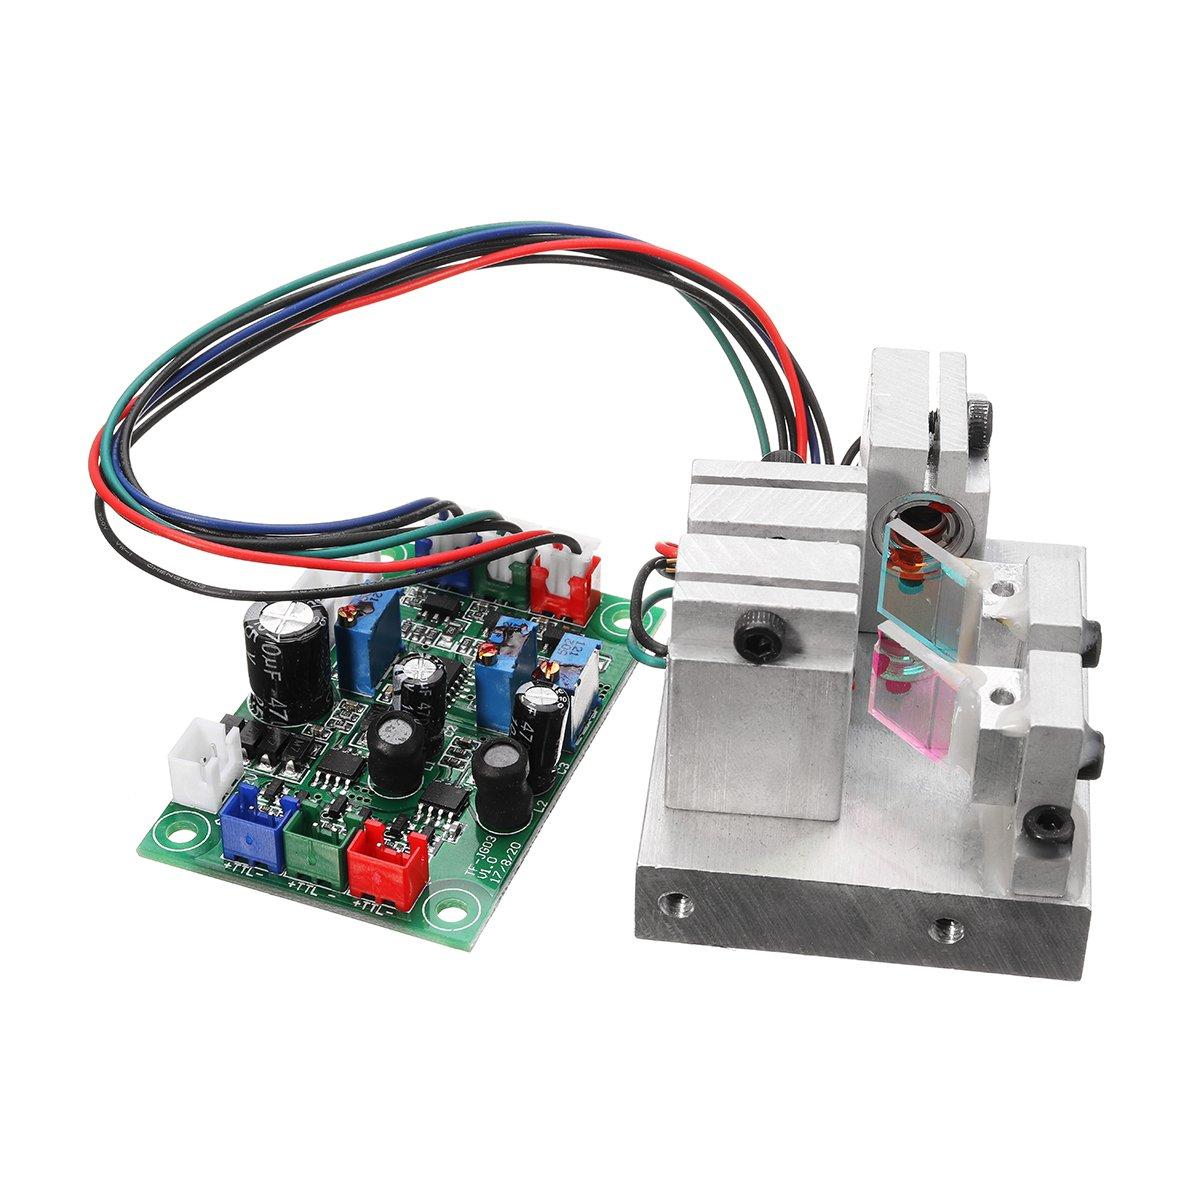 RGB 300mW White Laser Dot Module Red Green Blue 638nm 520nm 450nm TTL Driver Modulation